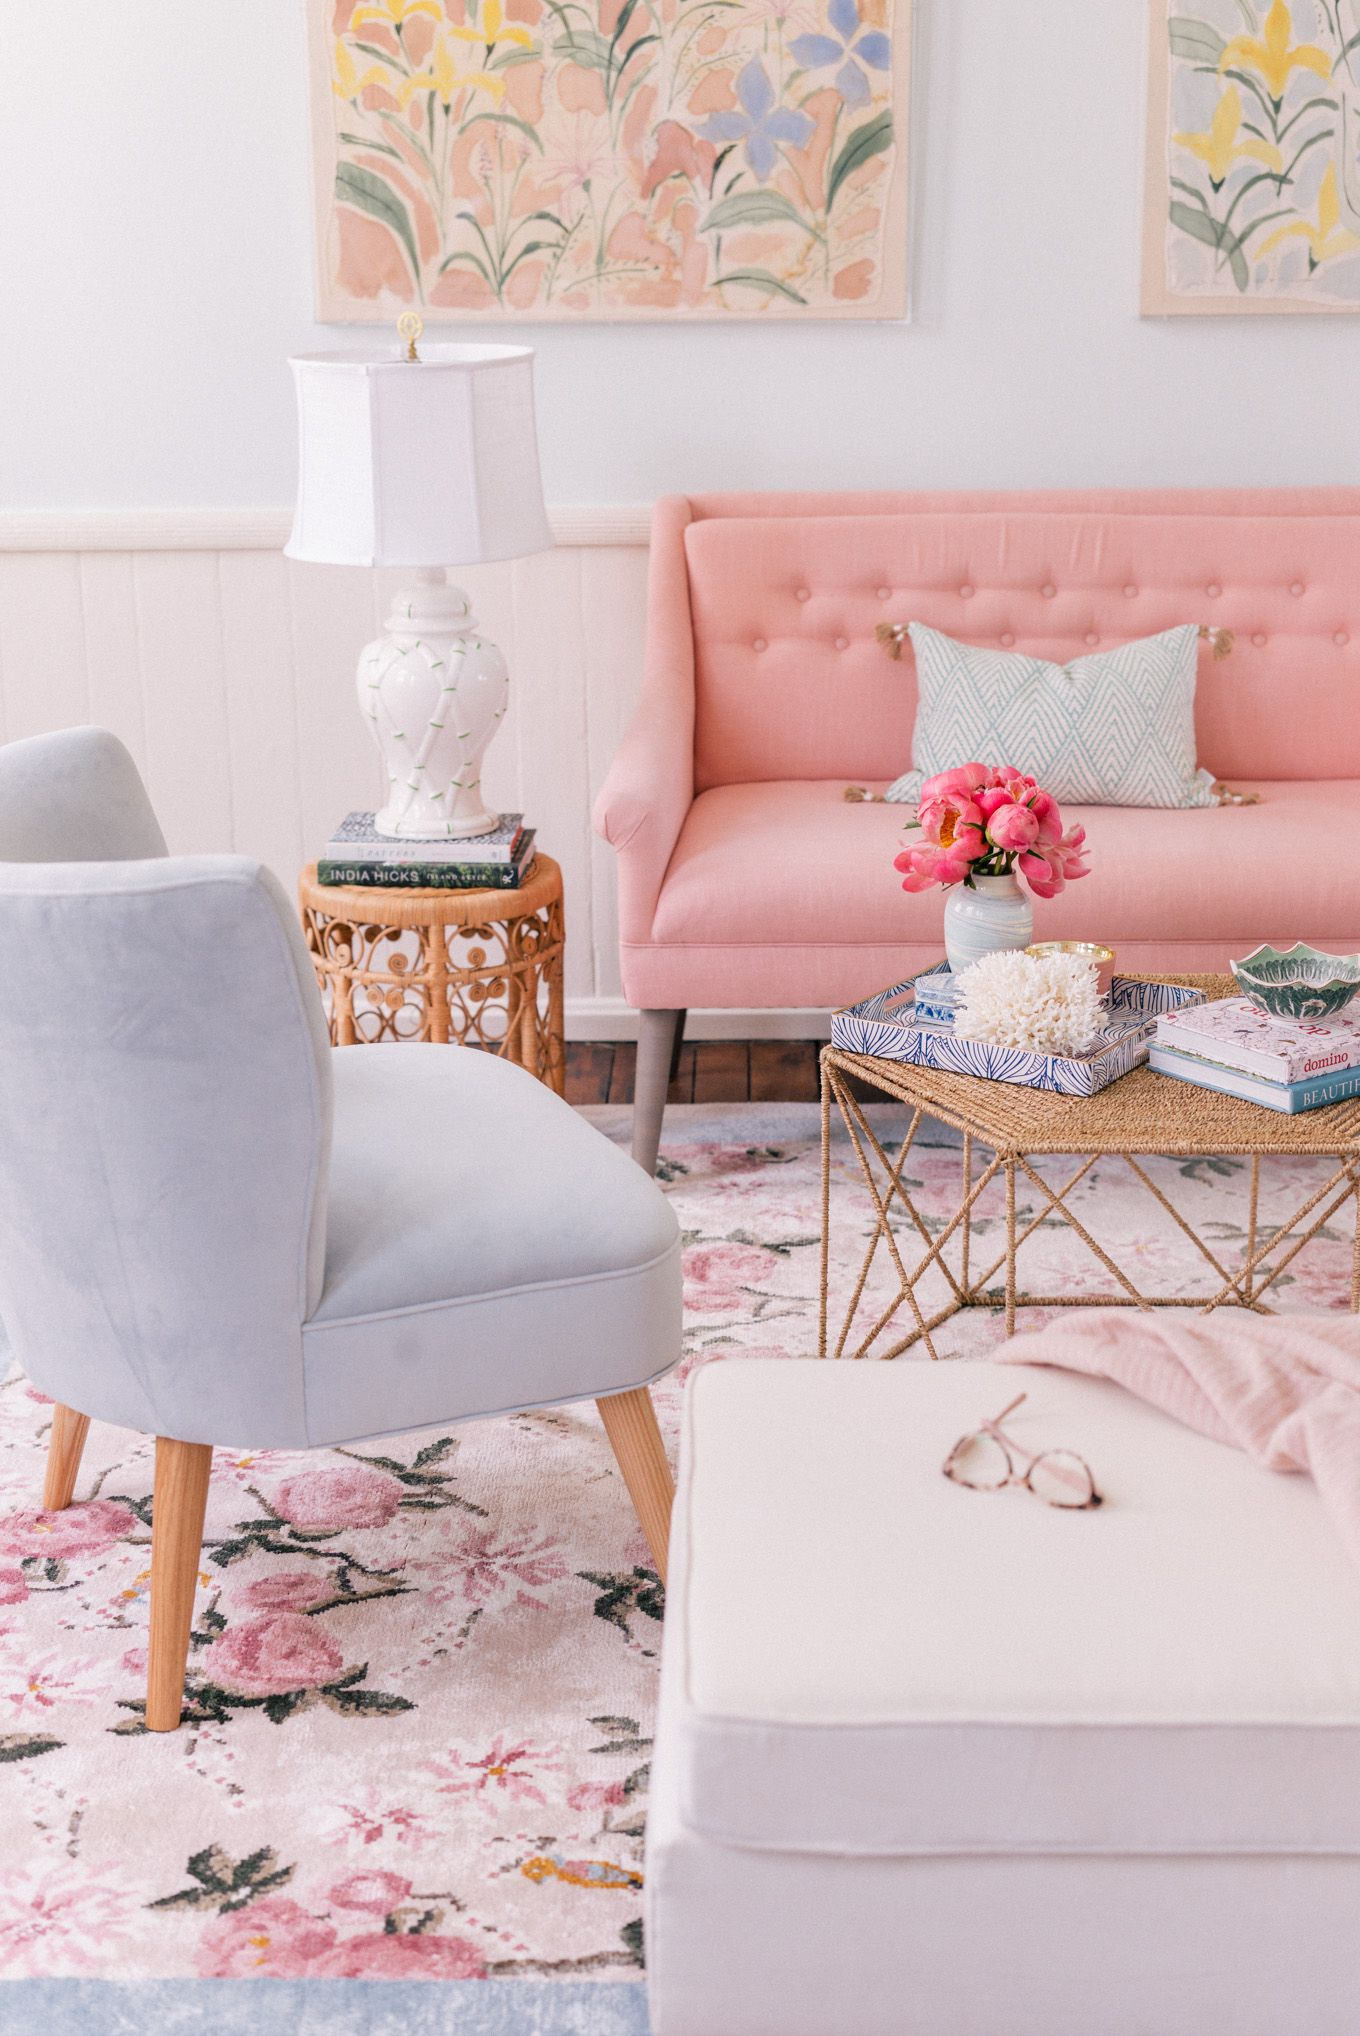 living room, pink flowery rug, white ottoman, grey chair, pink sofa, rattan coffee tbale, rattan side table, white wainscoting